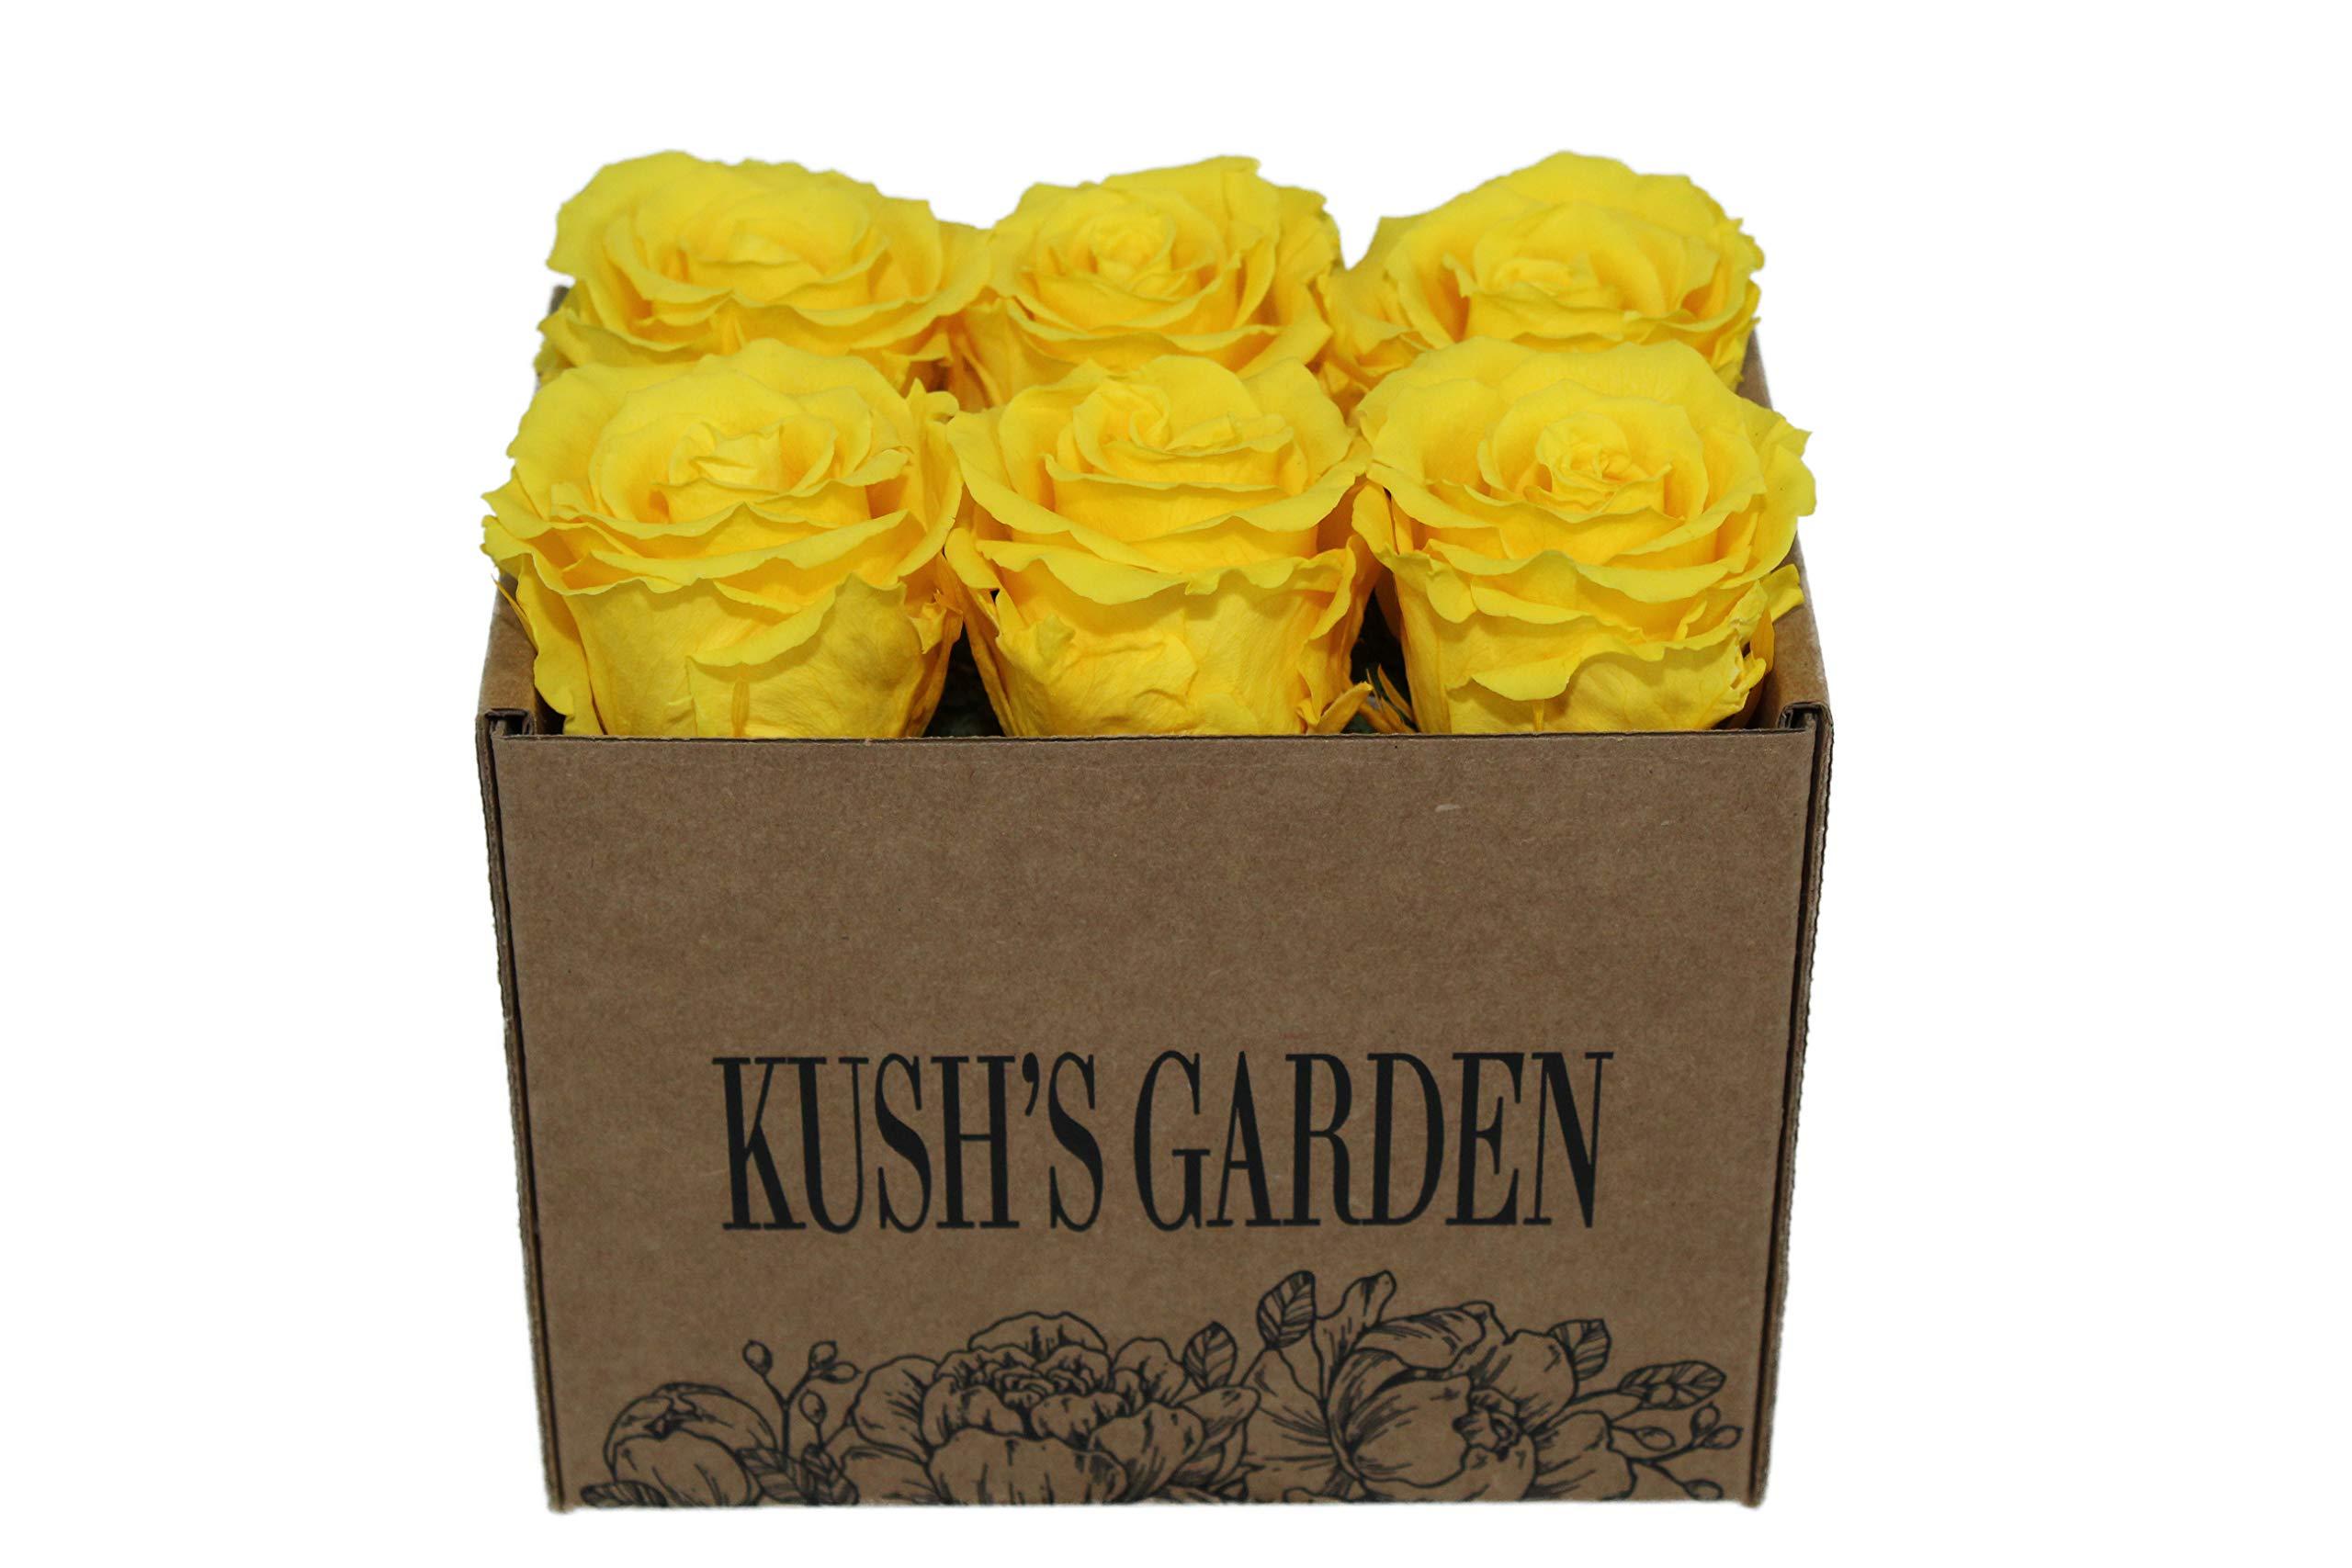 KUSHS GARDEN Real Preserved Roses in Box (Sunshine Yellow)